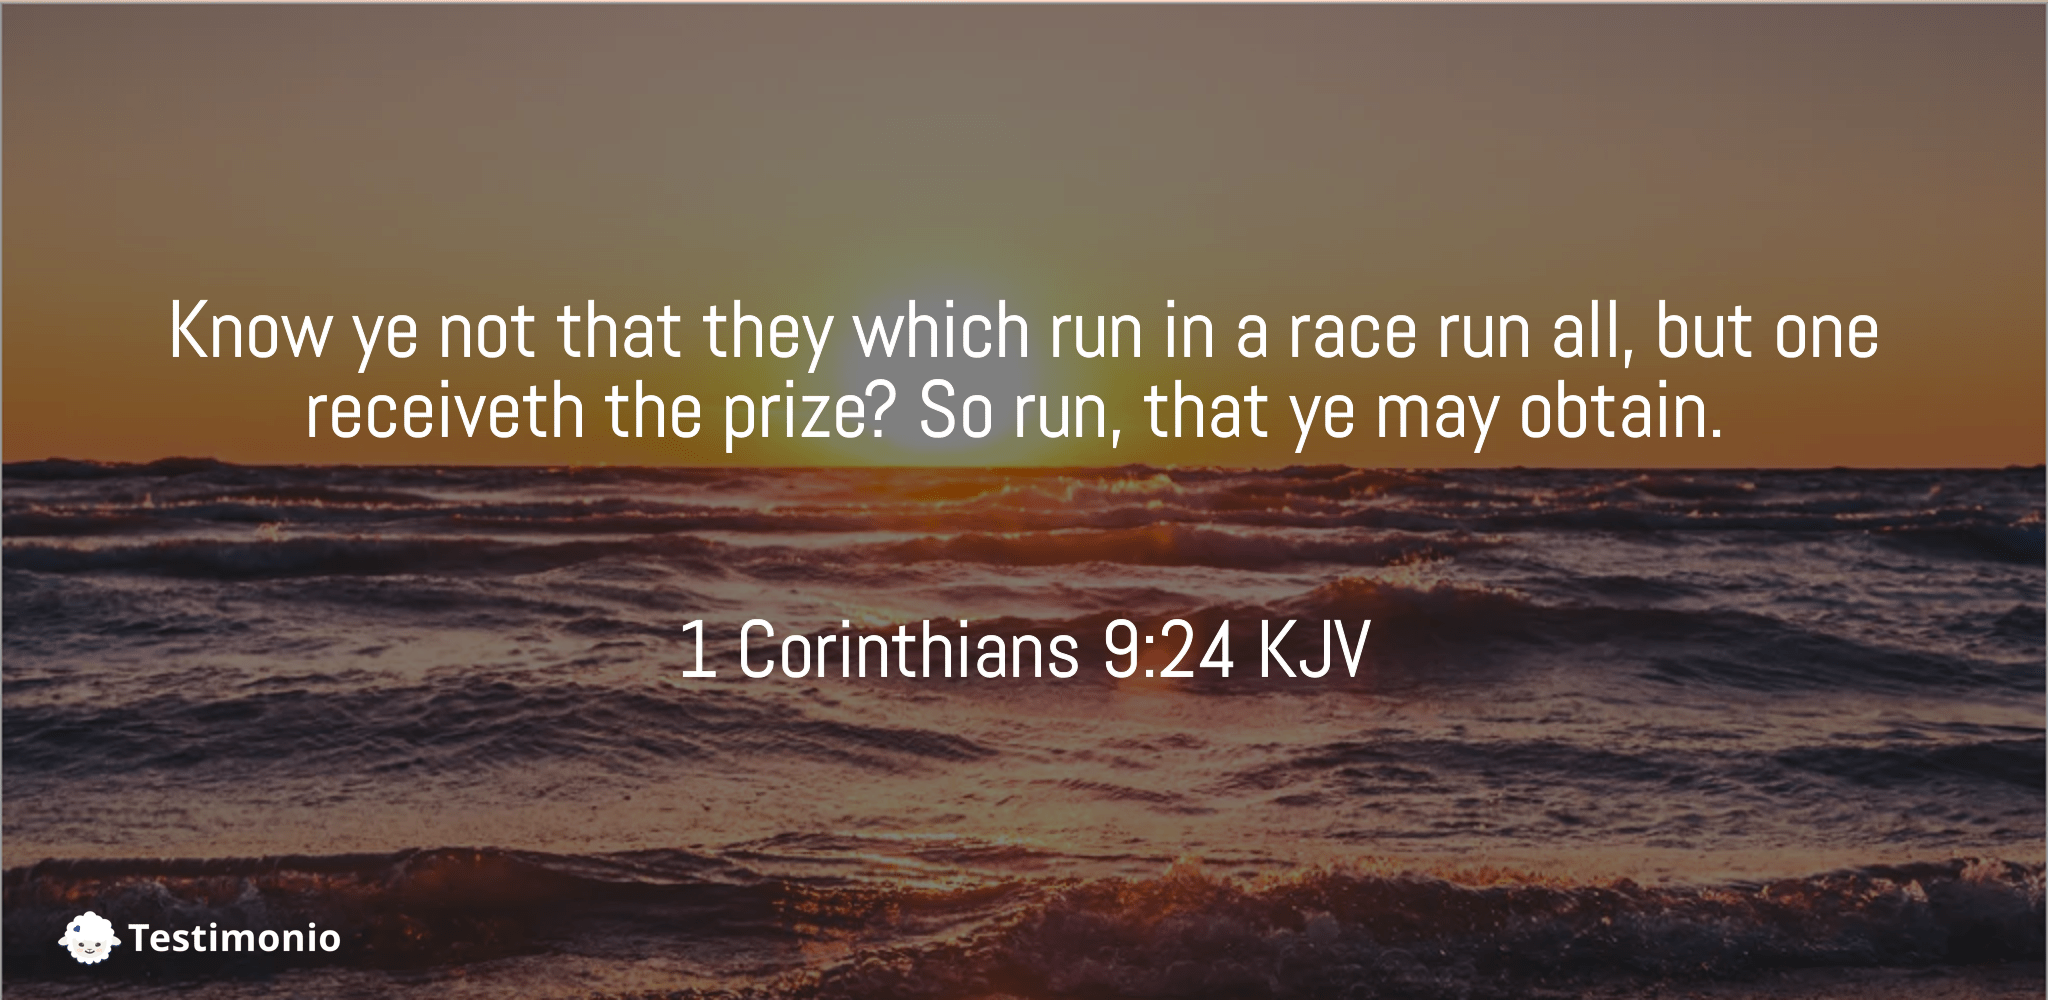 1 Corinthians 9:24